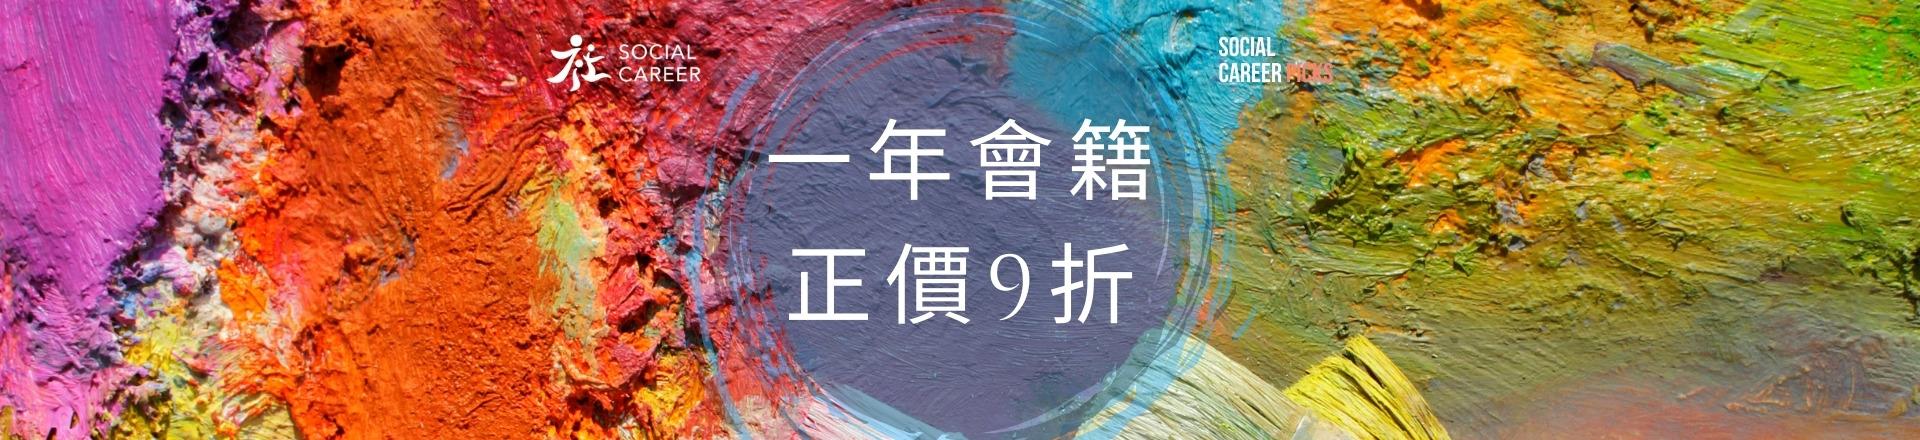 社職 x HKID Gallery & D-Barn 會籍優惠!